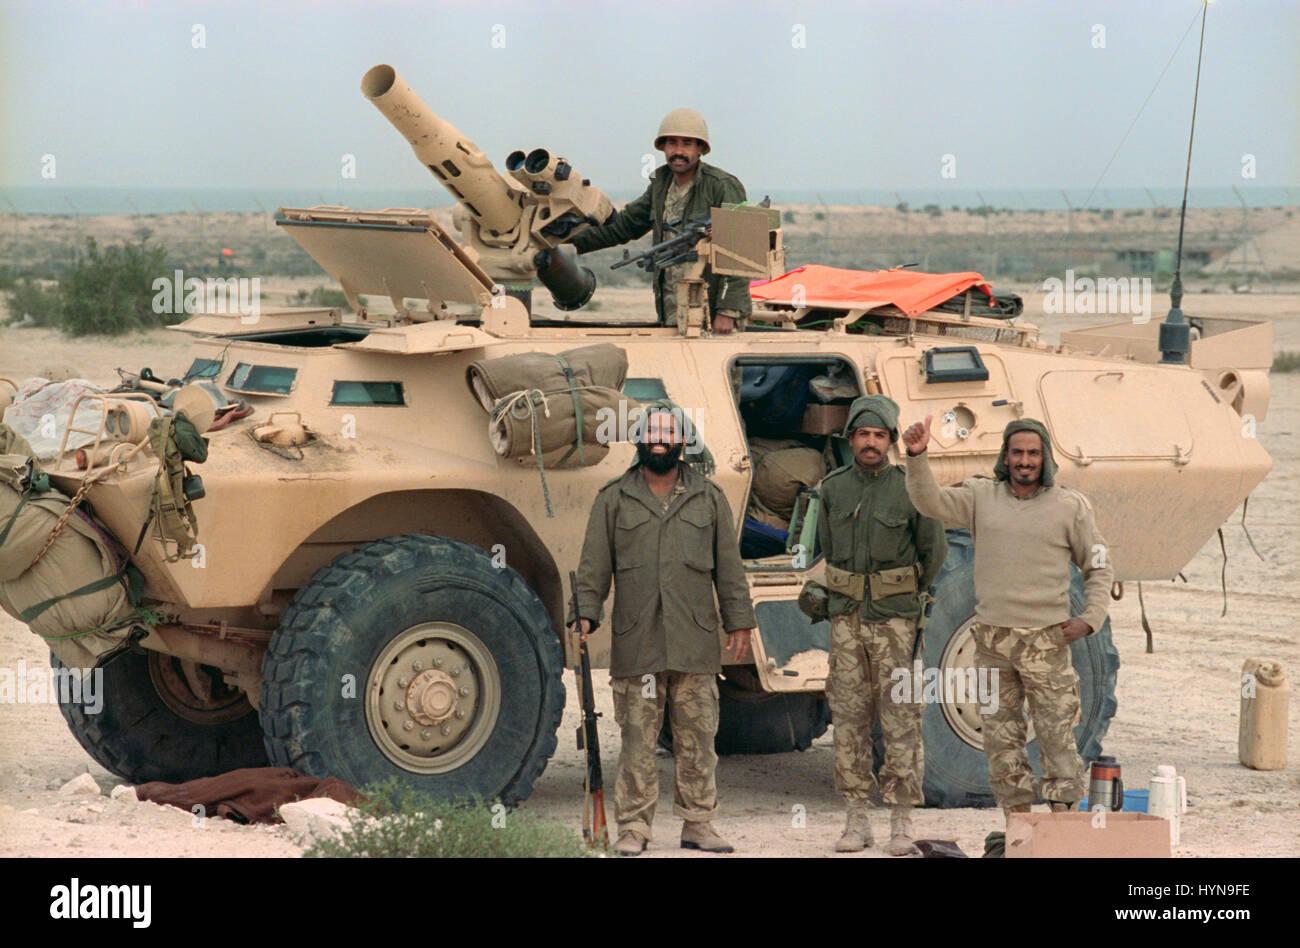 Saudi Arabian National Guard soldiers stand guard along a road after the Battle of Khafji February 2, 1991 in Khafji - Stock Image